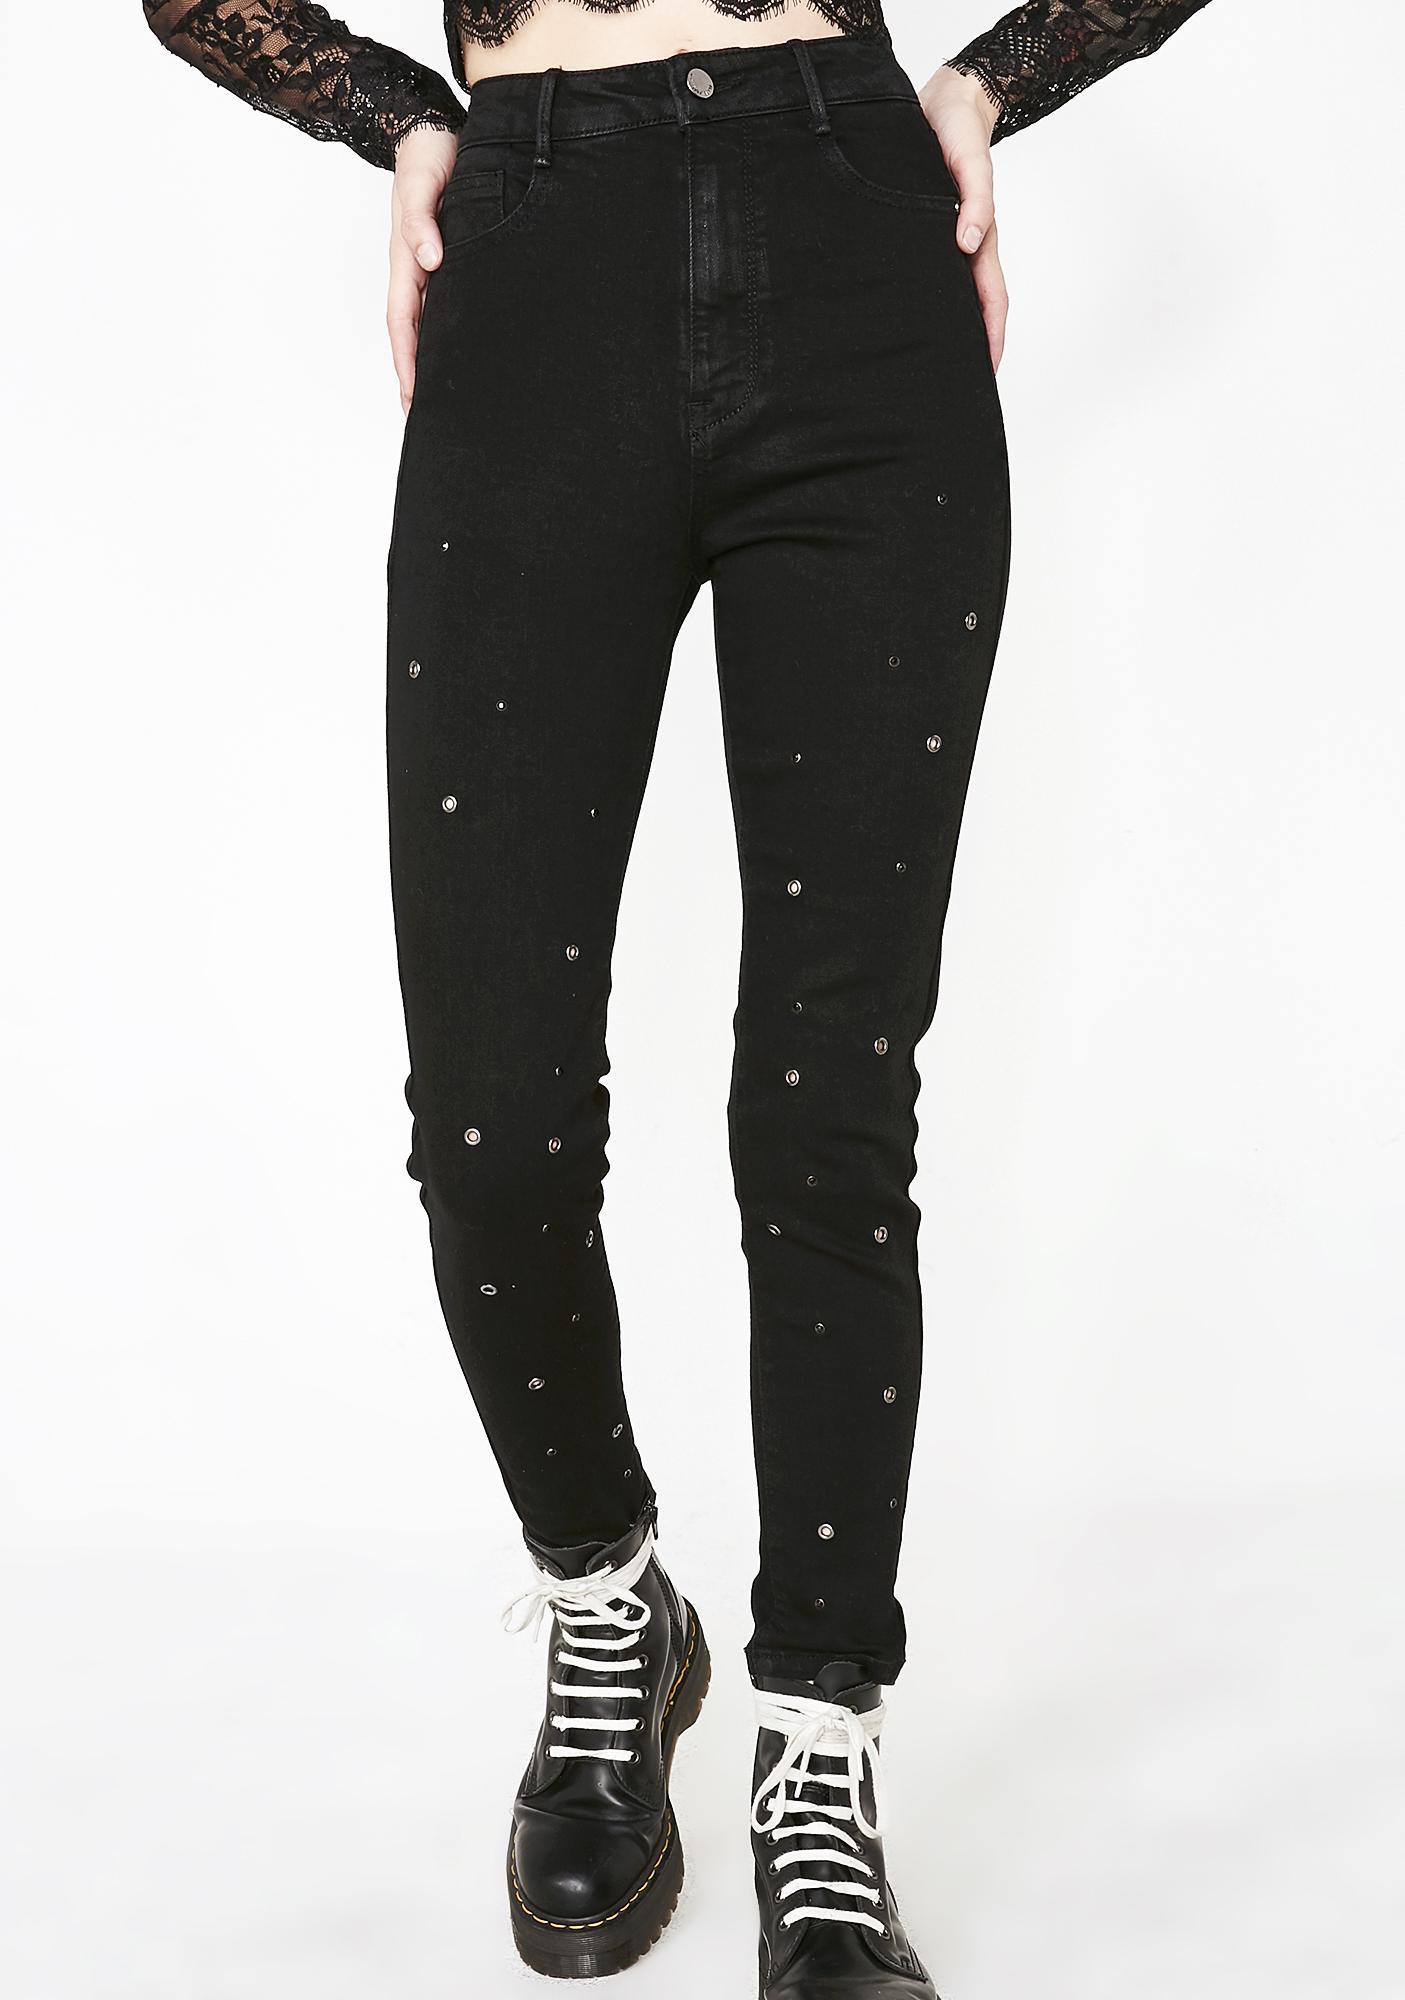 61862be1f41 Black Grommet Skinny Jeans | Dolls Kill